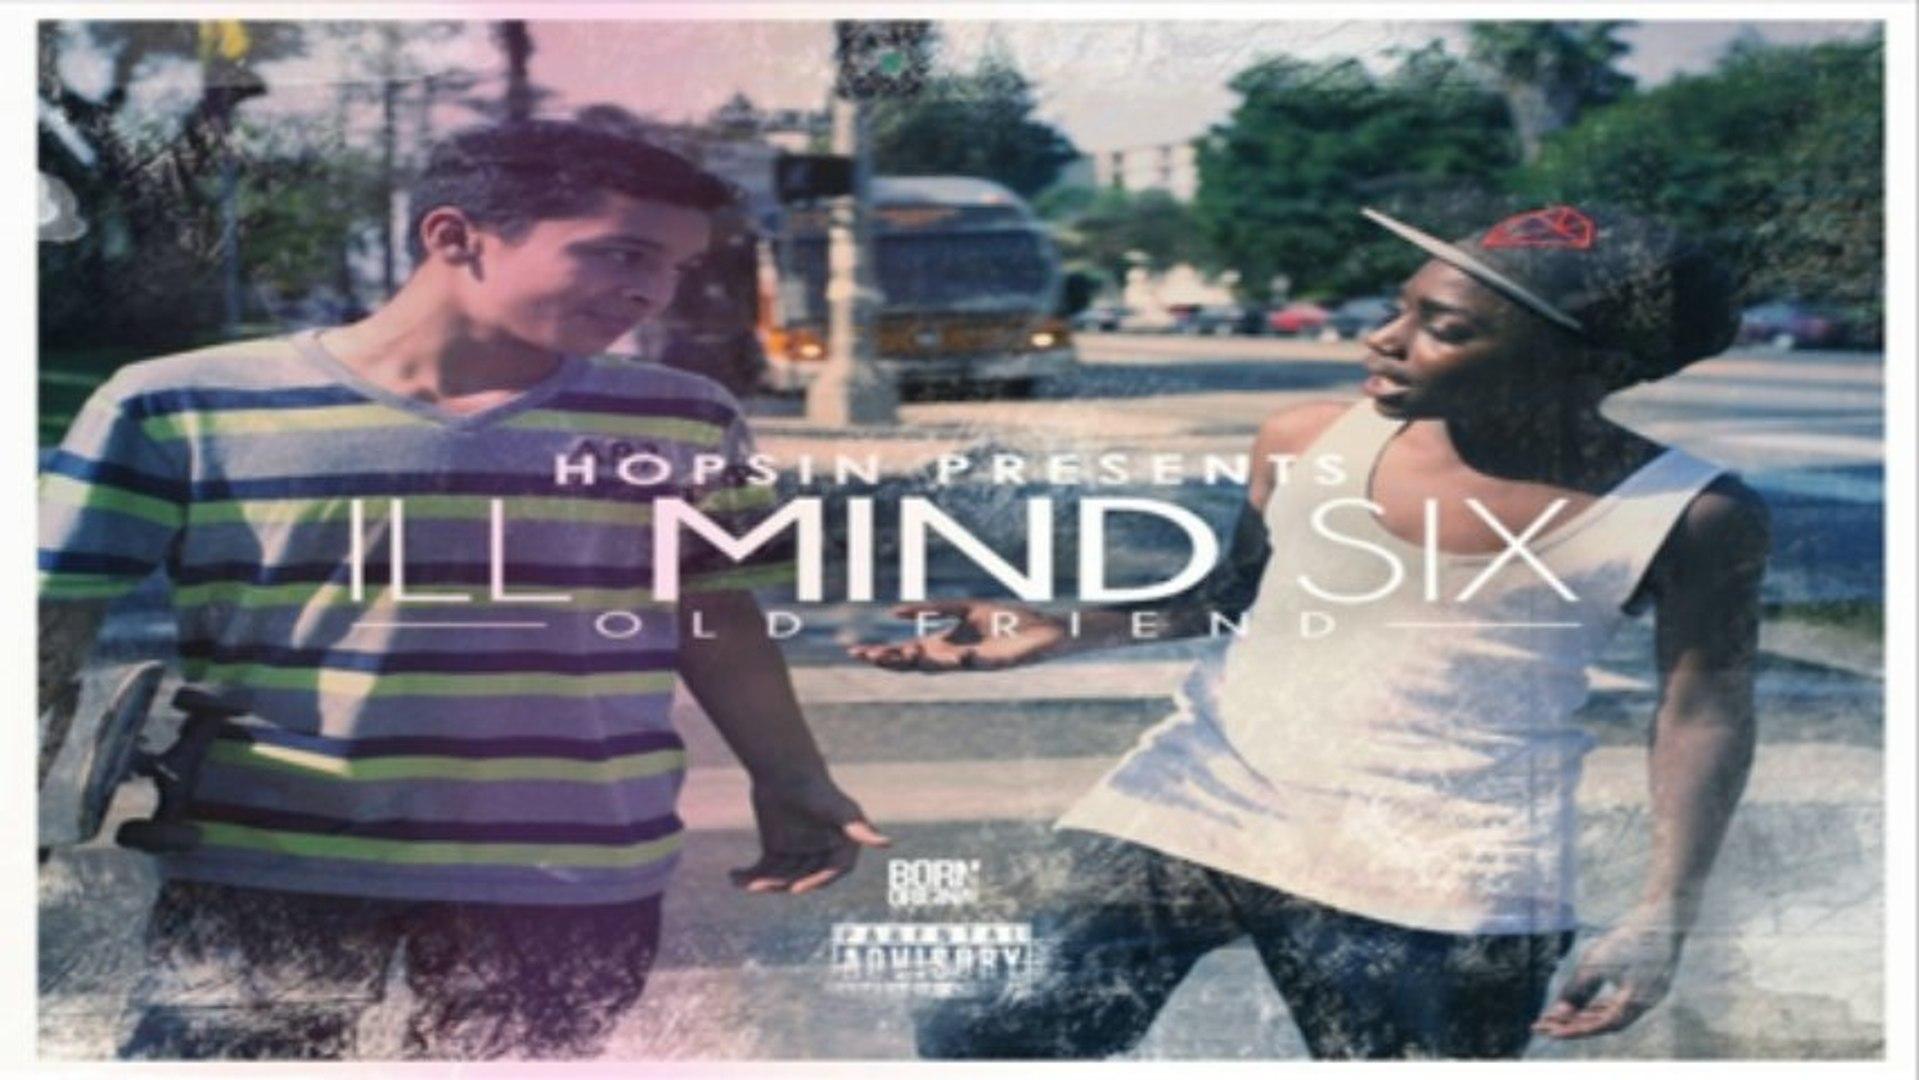 [ DOWNLOAD MP3 ] Hopsin - Ill Mind Six: Old Friend [Explicit] [ iTunesRip ]